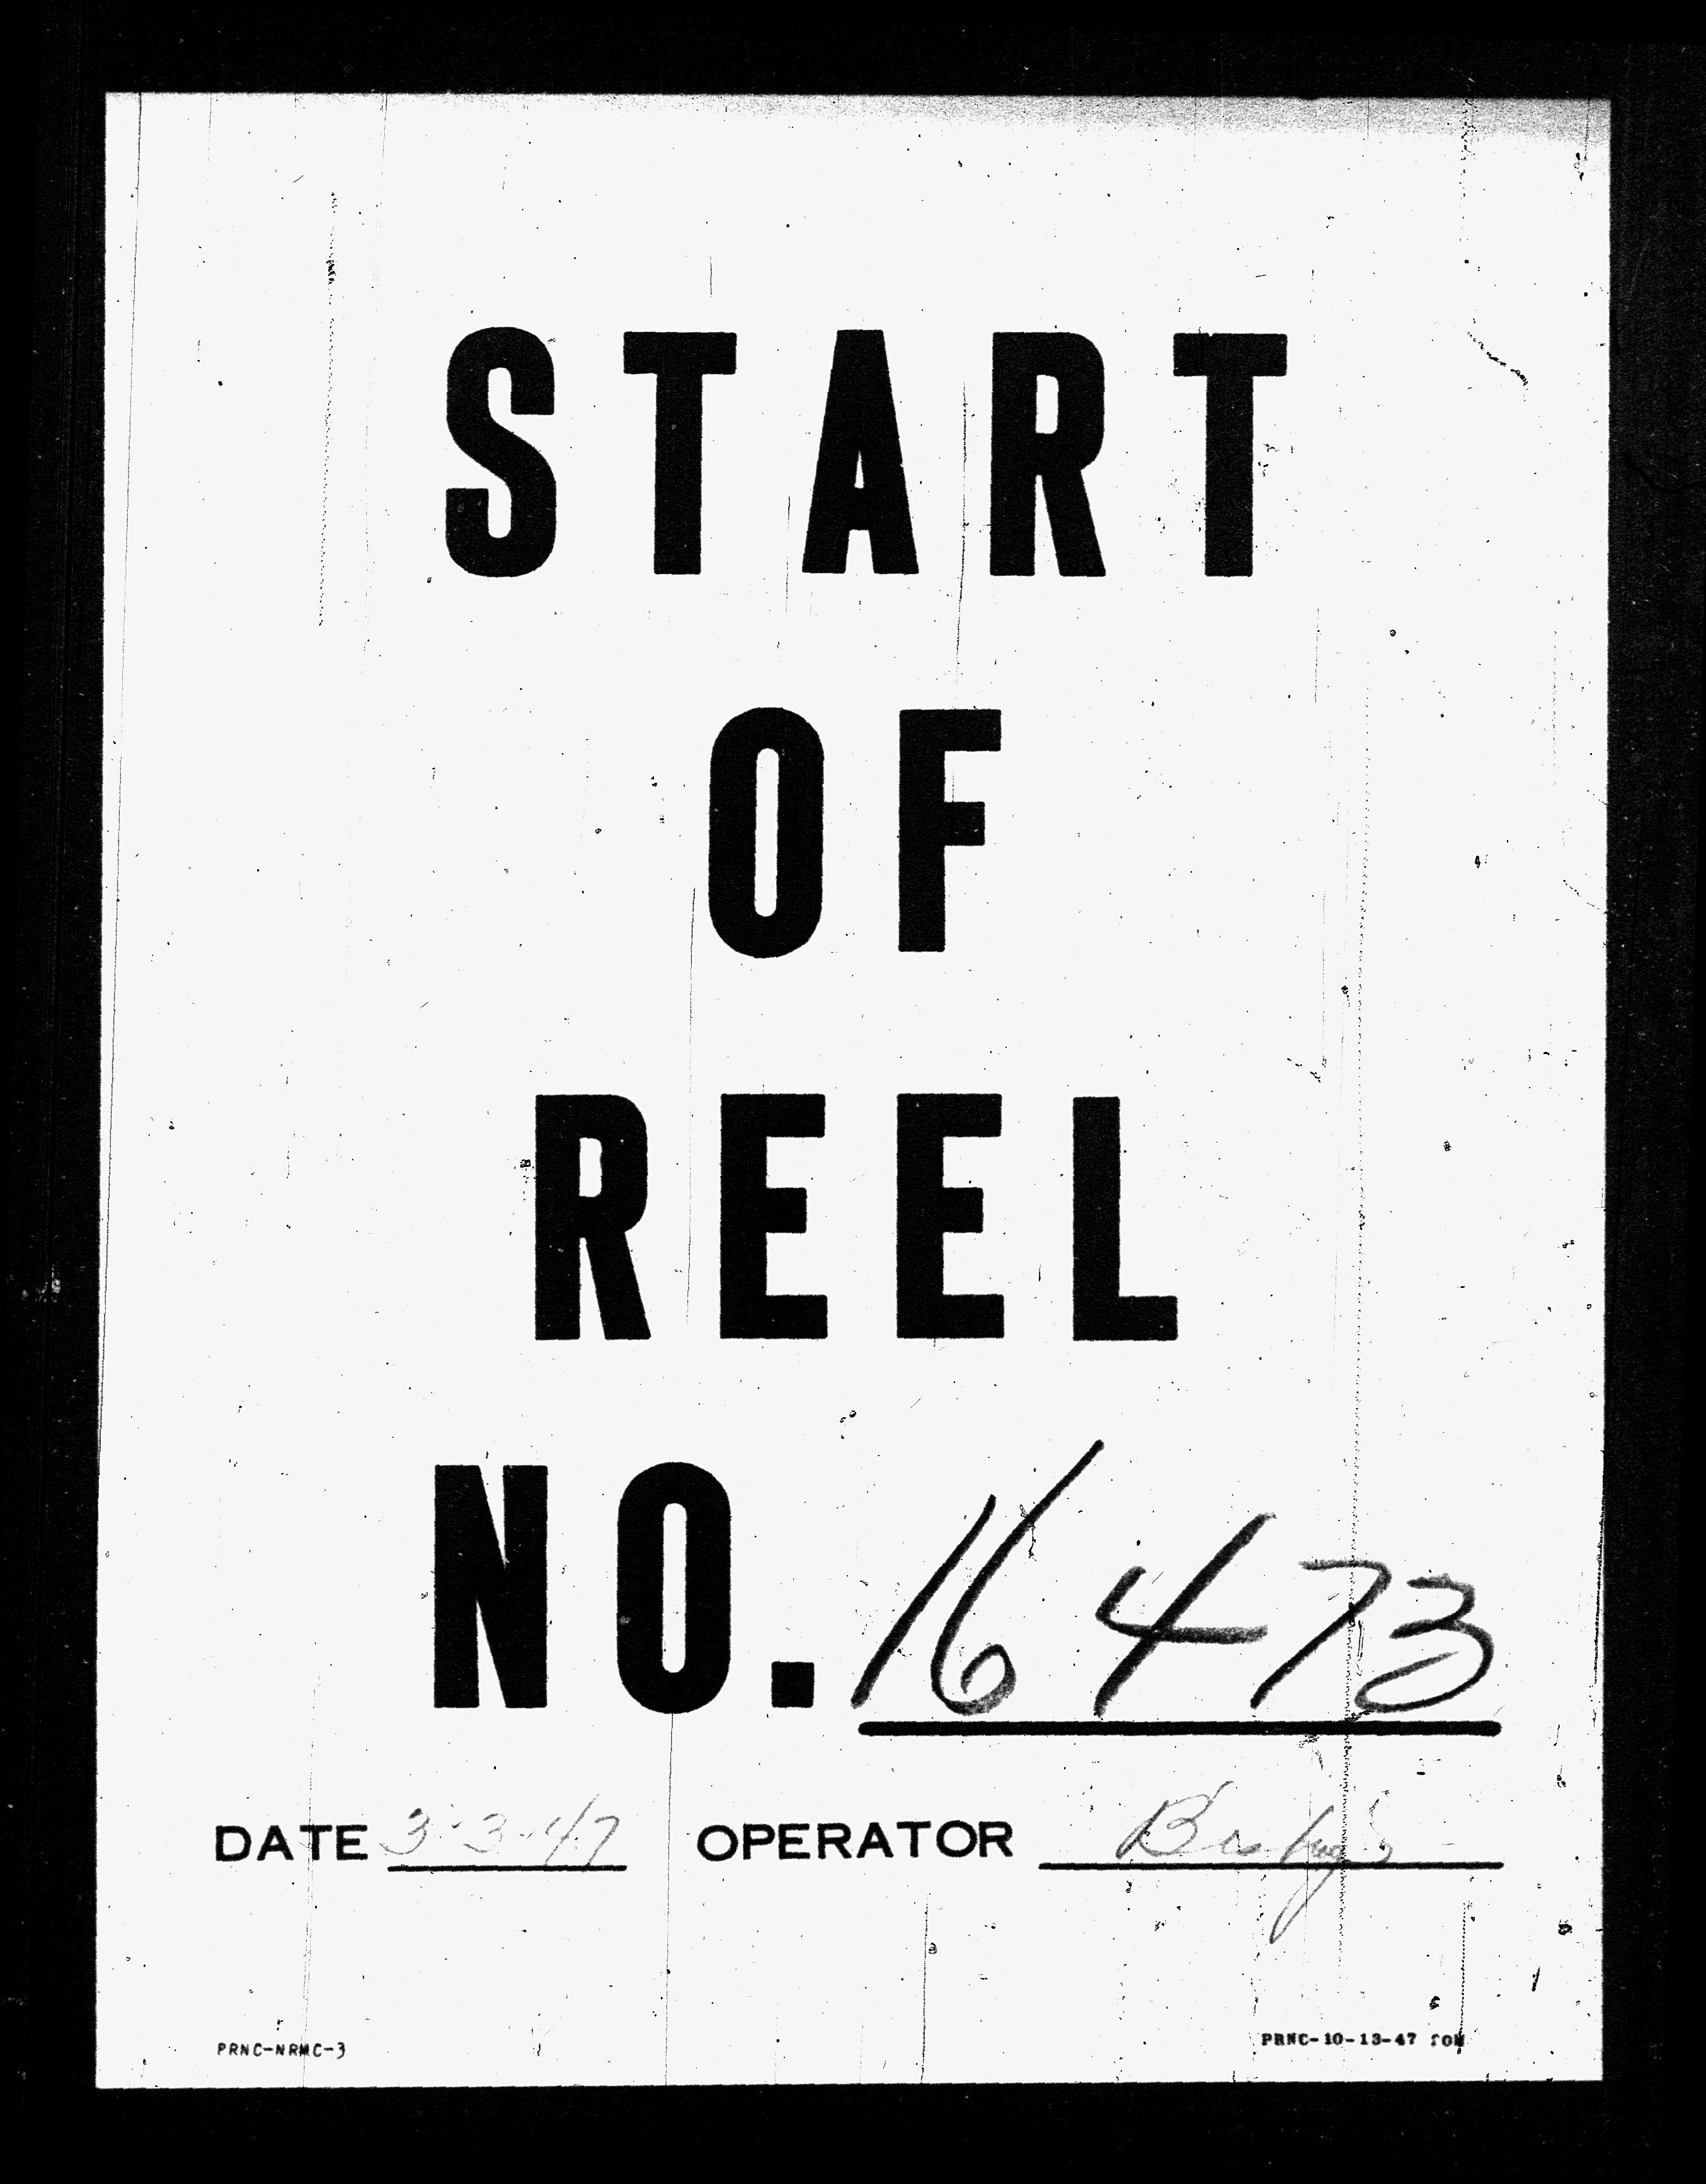 Anti-Submarine Warfare Training Center (Section) Frontier Base, Charleston, SC. 11/30/42 to 7/1/45